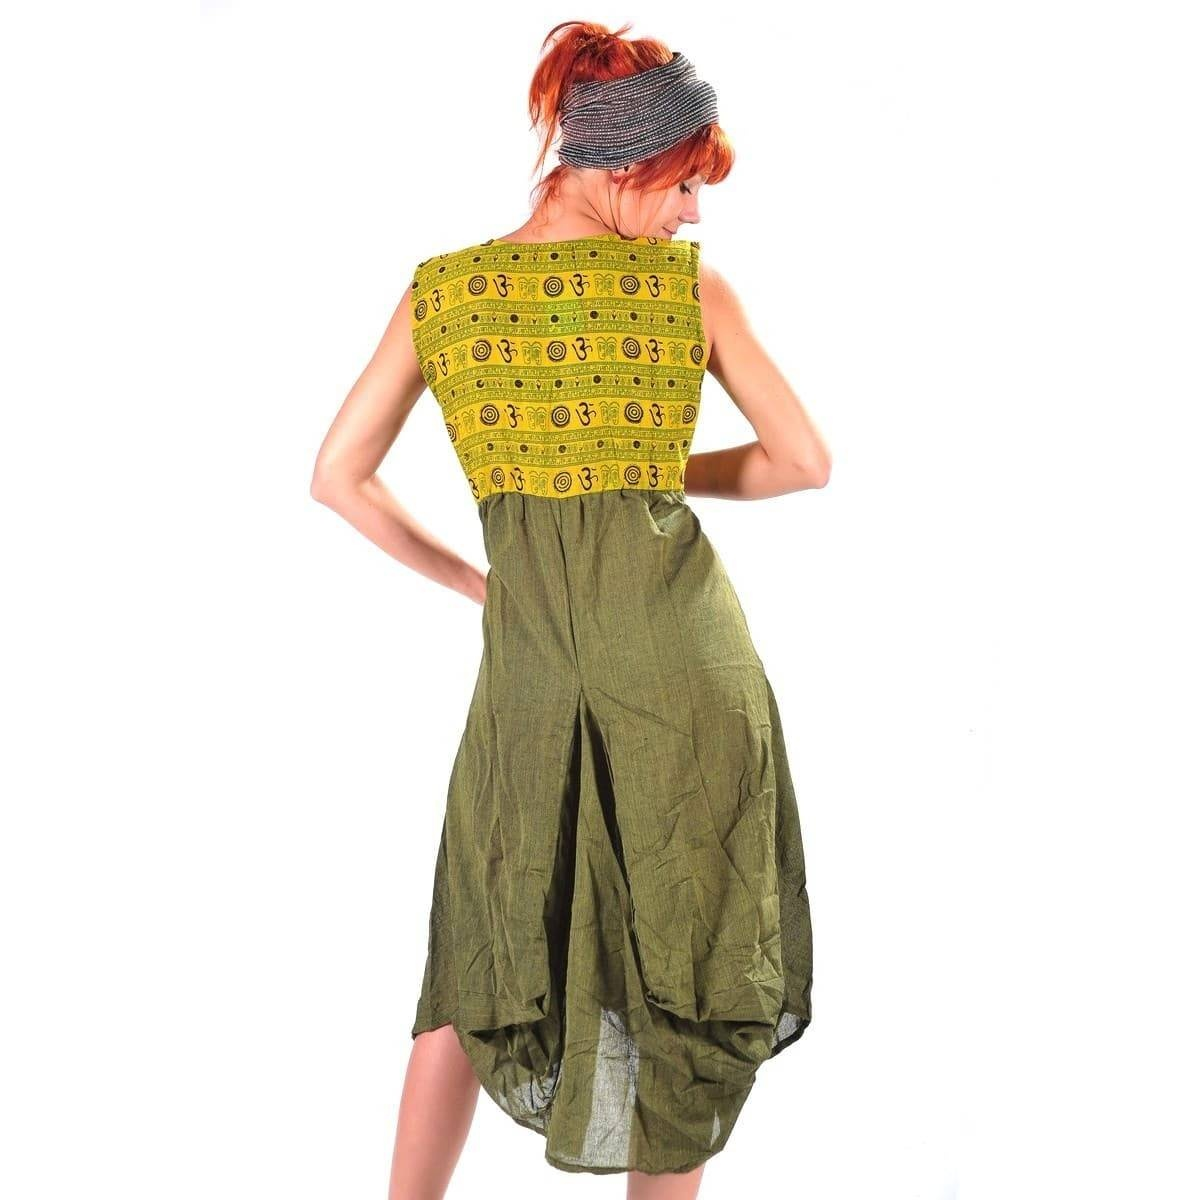 strap dress long maxi evening dress summer clothes sleeveless ethno goa nepal ebay. Black Bedroom Furniture Sets. Home Design Ideas